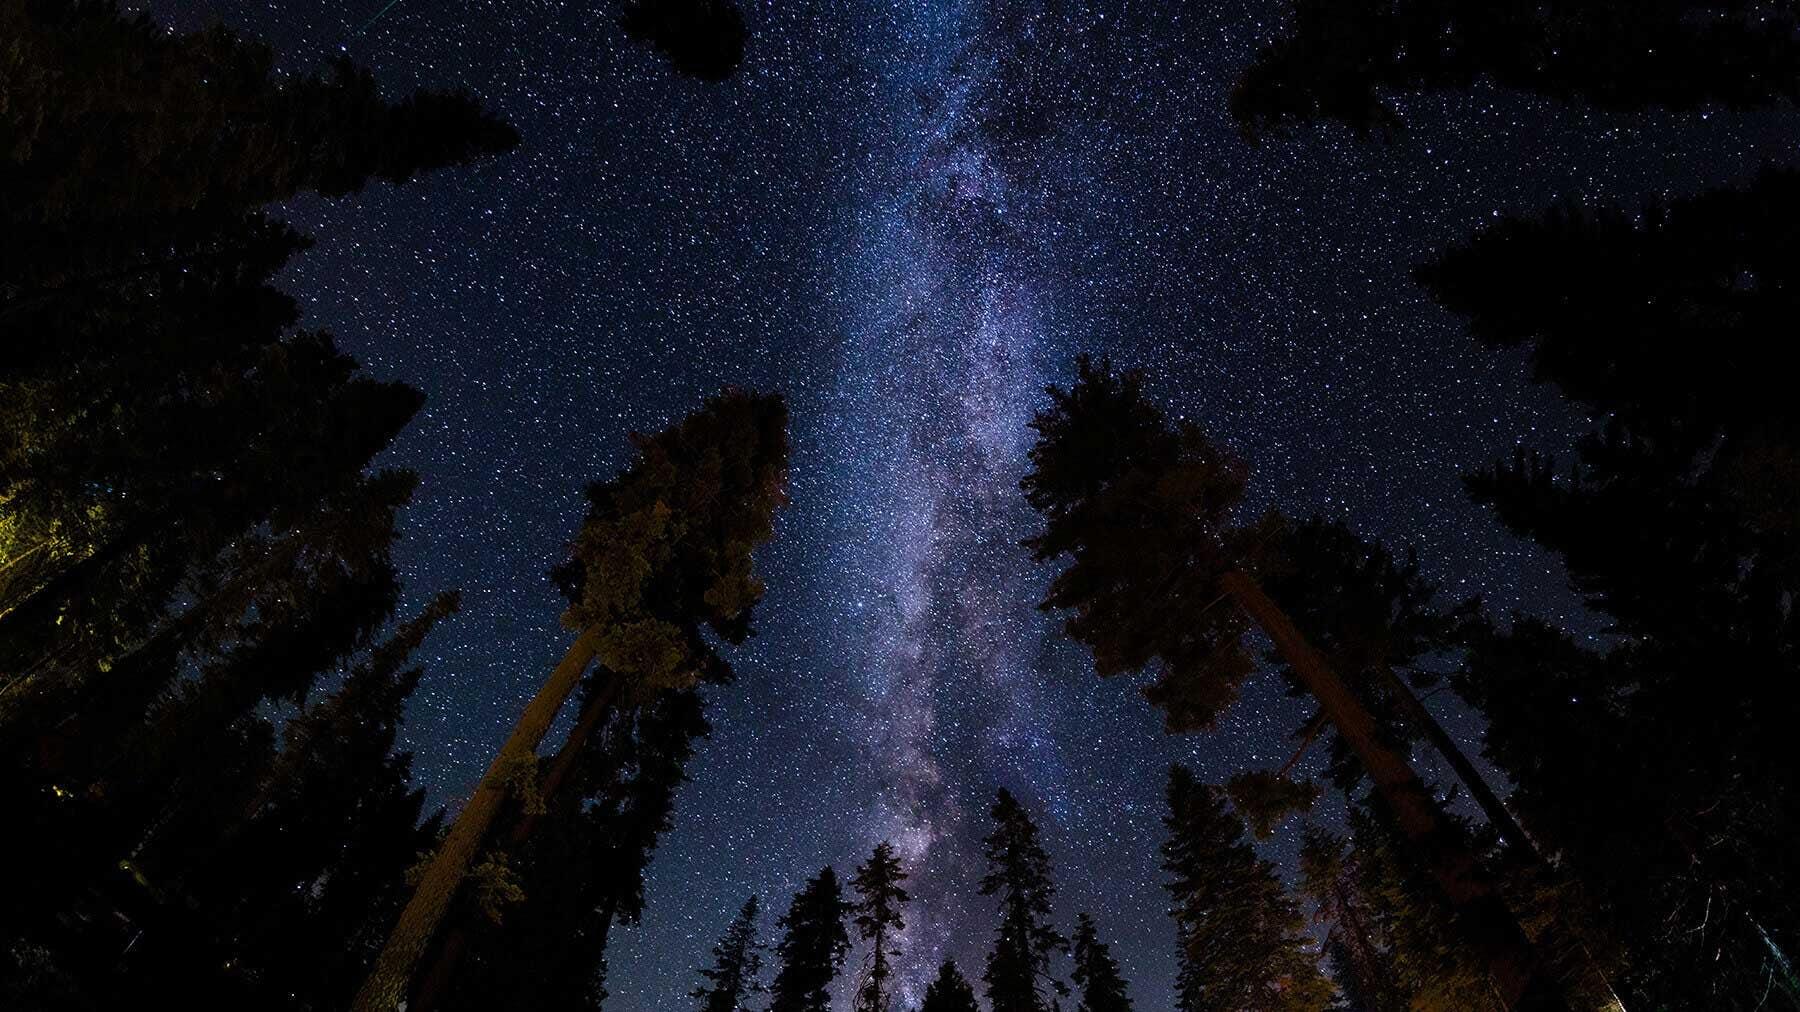 Starry skies at Voyageurs National Park